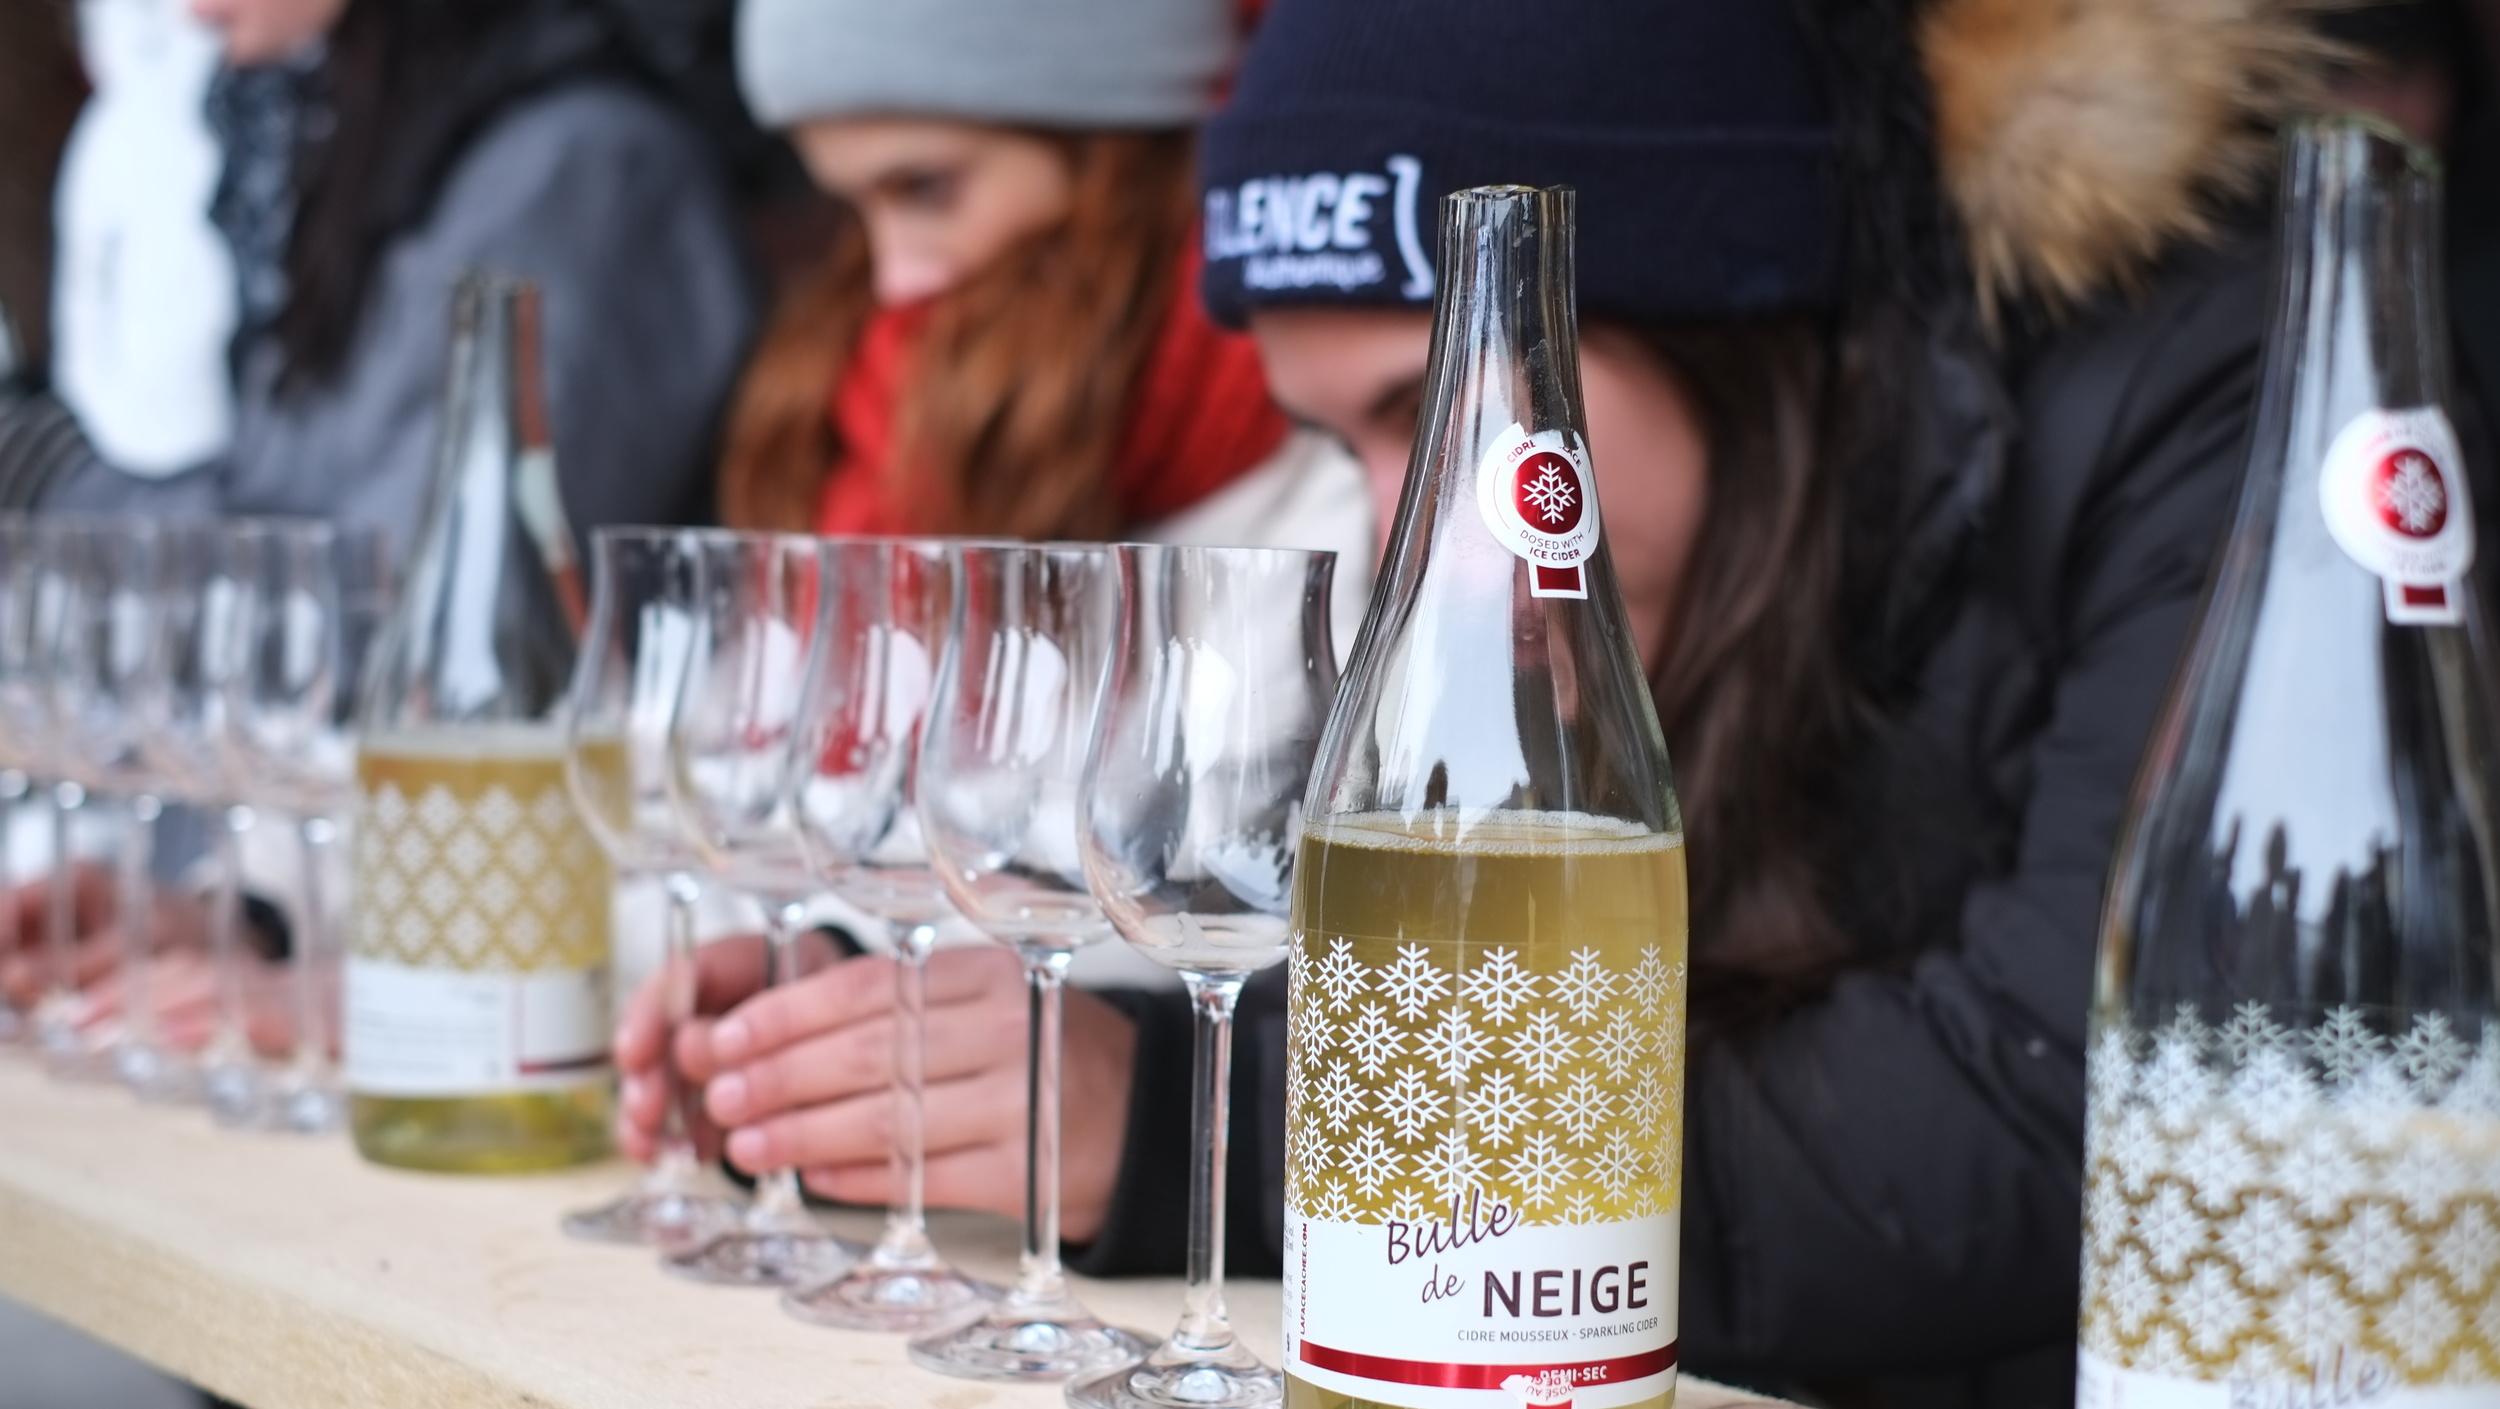 Toasting the Holidays With Quebec Spirits and Bubbly  – montrealgazette.com, December 18, 2014